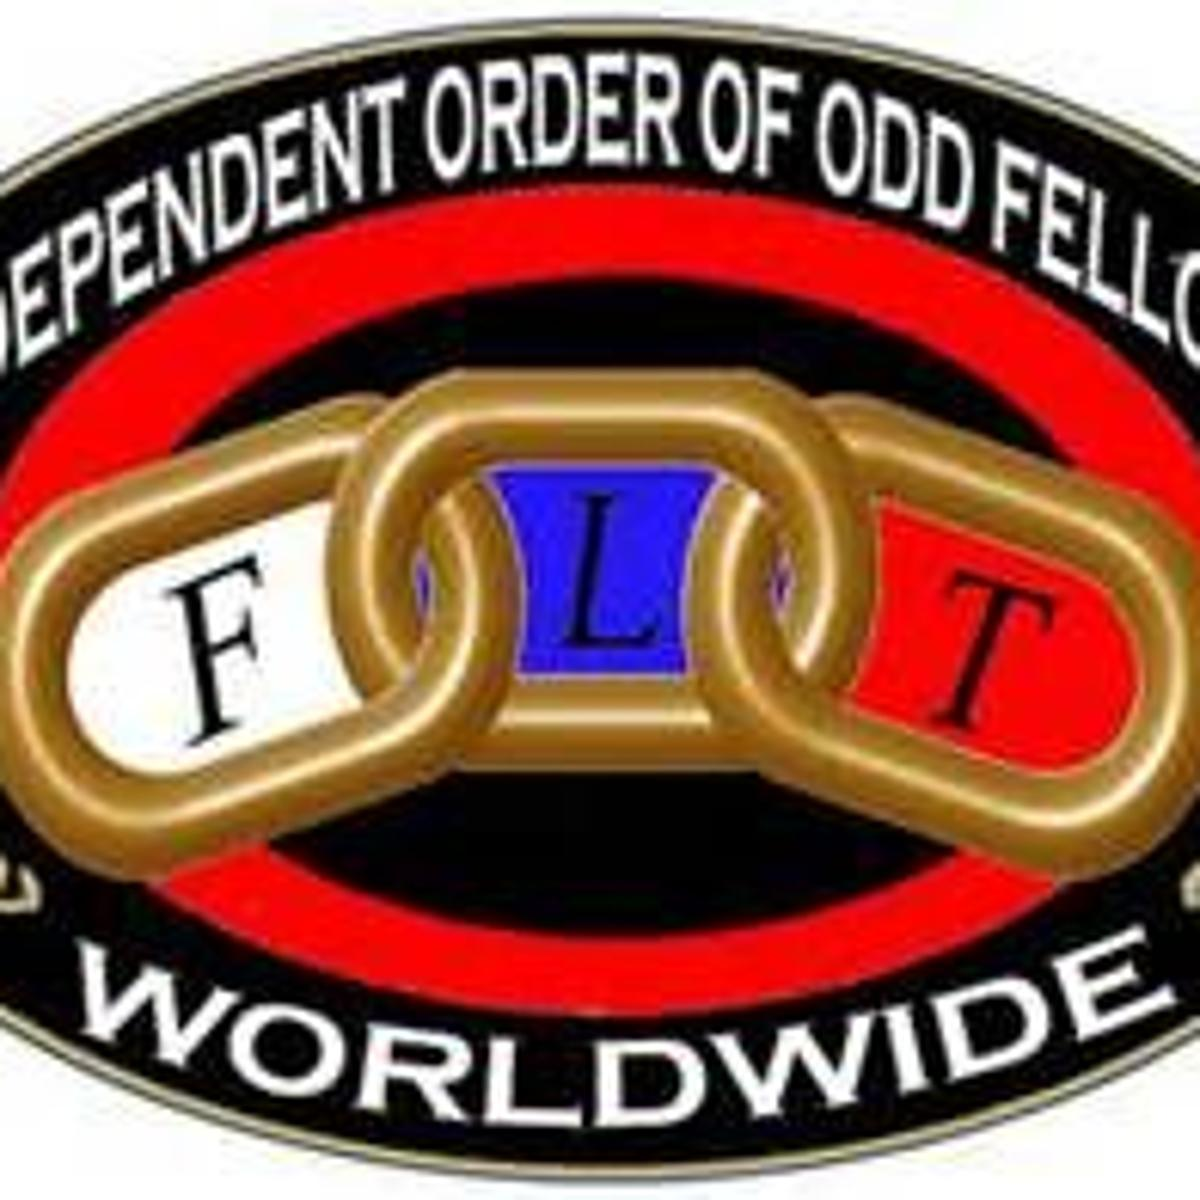 Sunday Meal At Cedar Falls Odd Fellows Lodge Local News